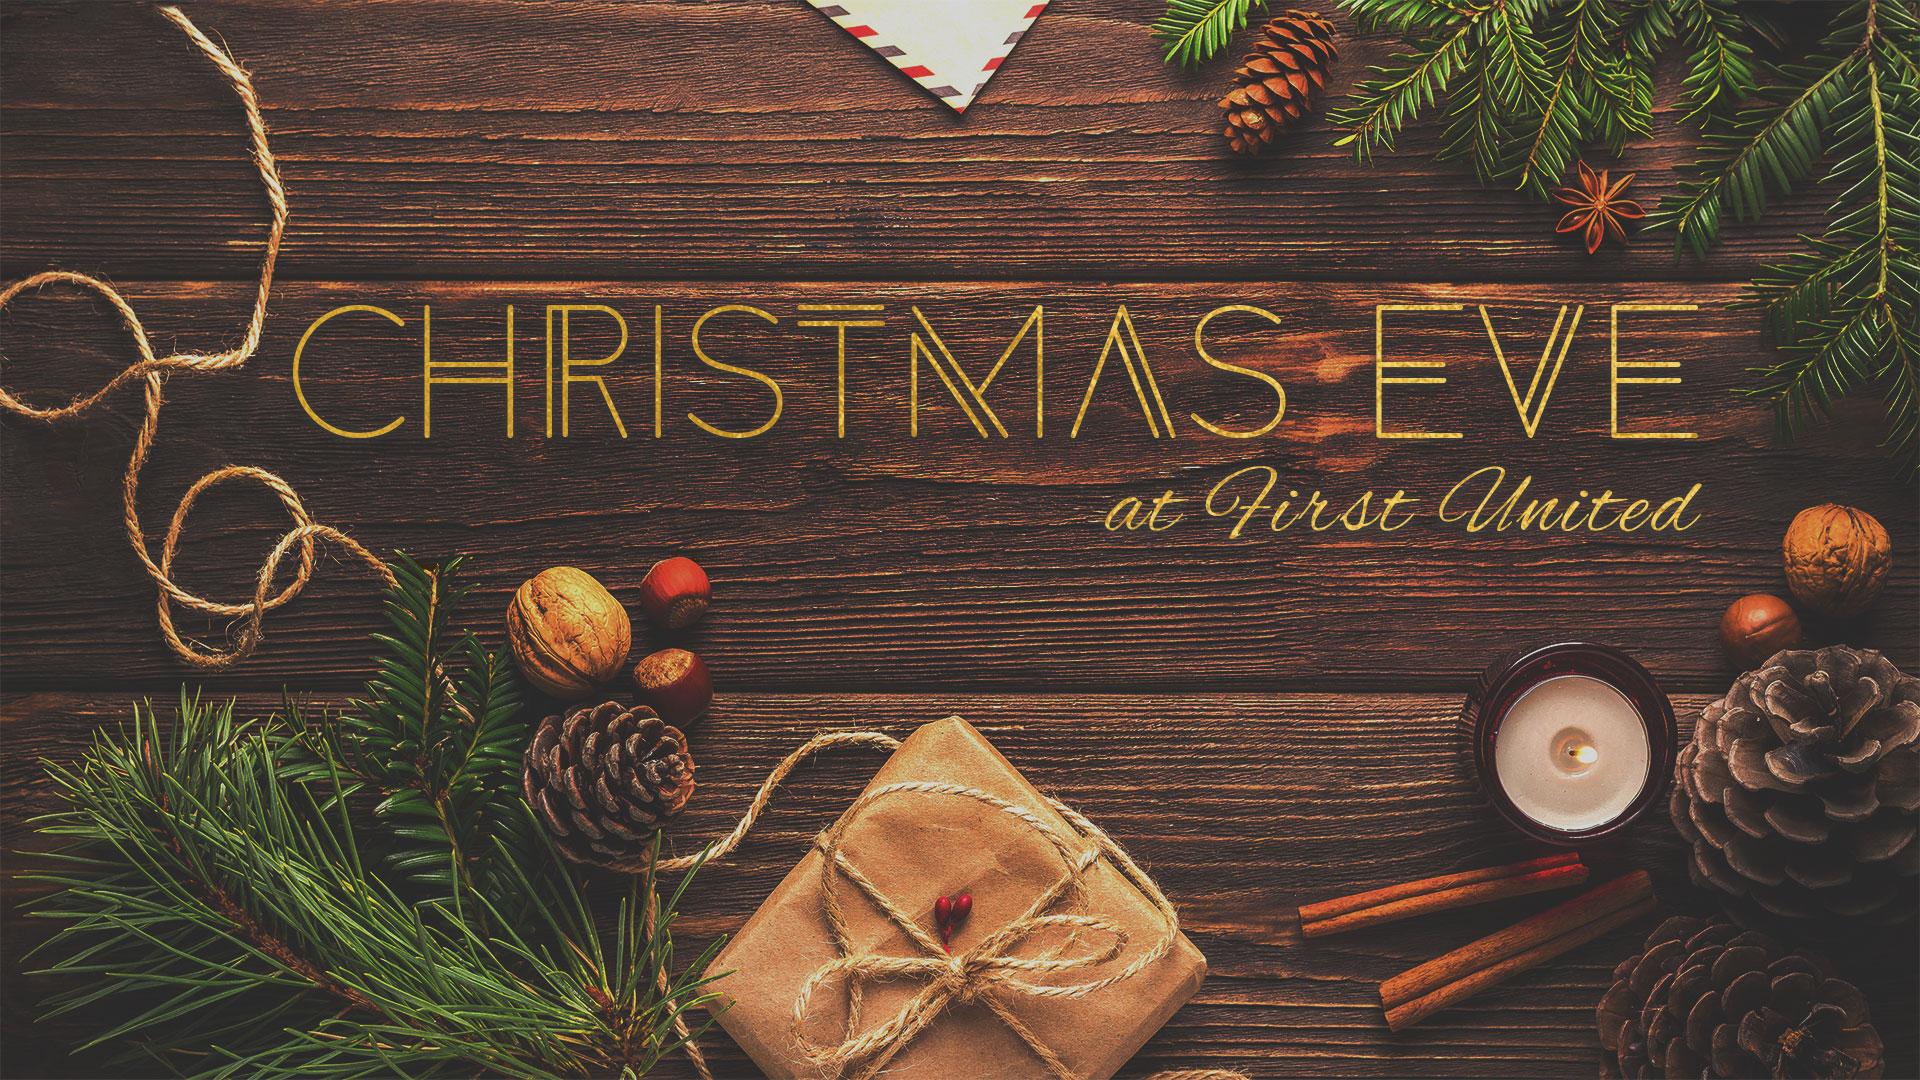 ChristmasEve_welcome_sermon.jpg